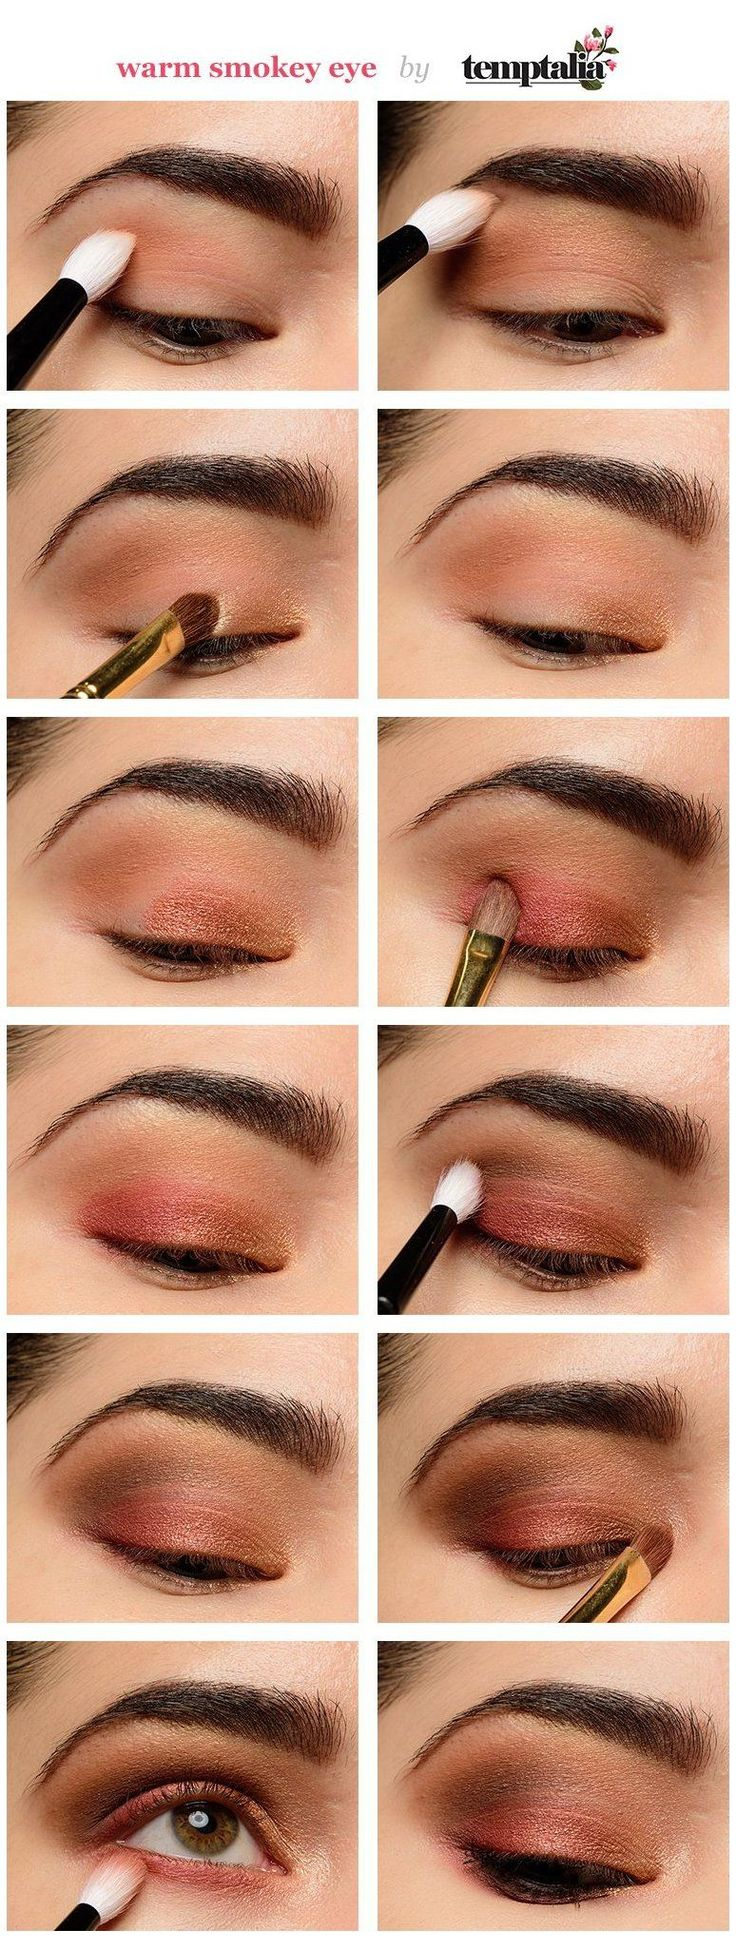 Kylie Jenner yellow eyeshadow inspired look in 2020 ...